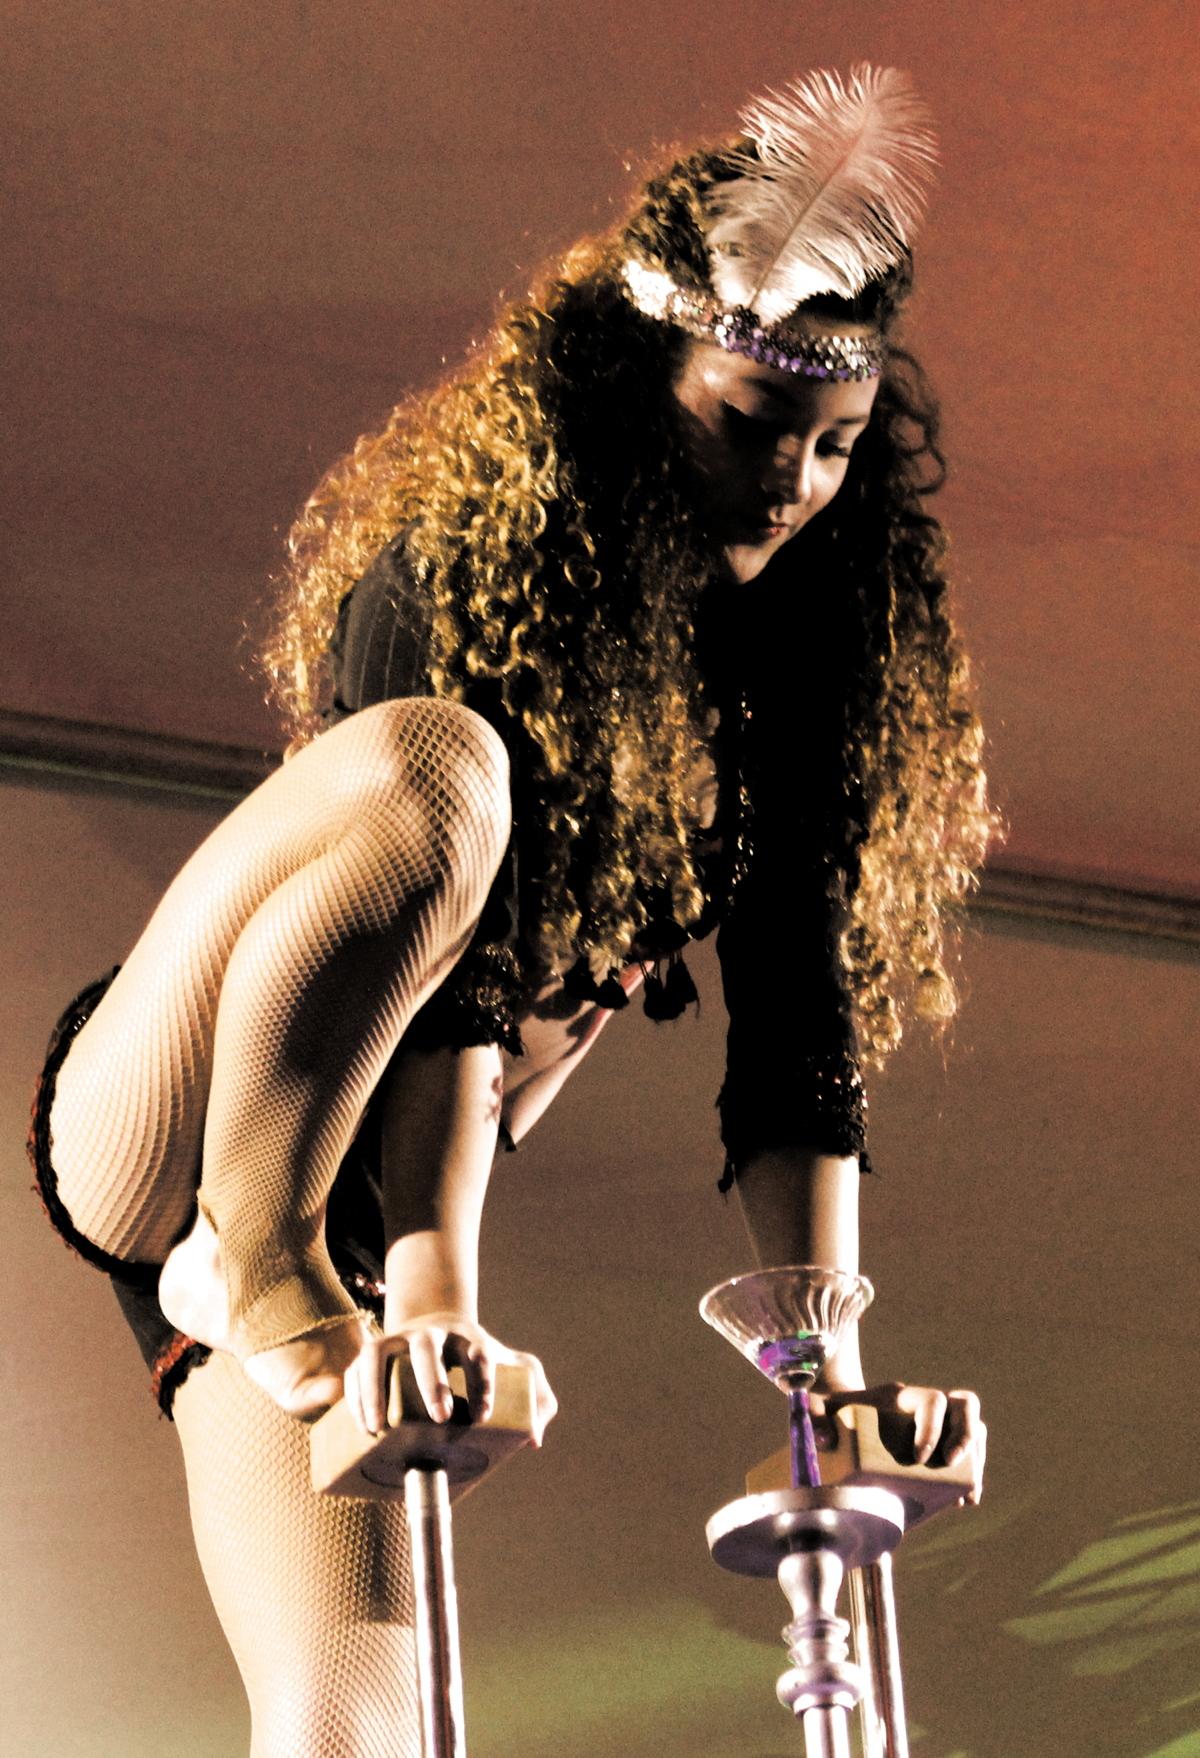 acrobat lady